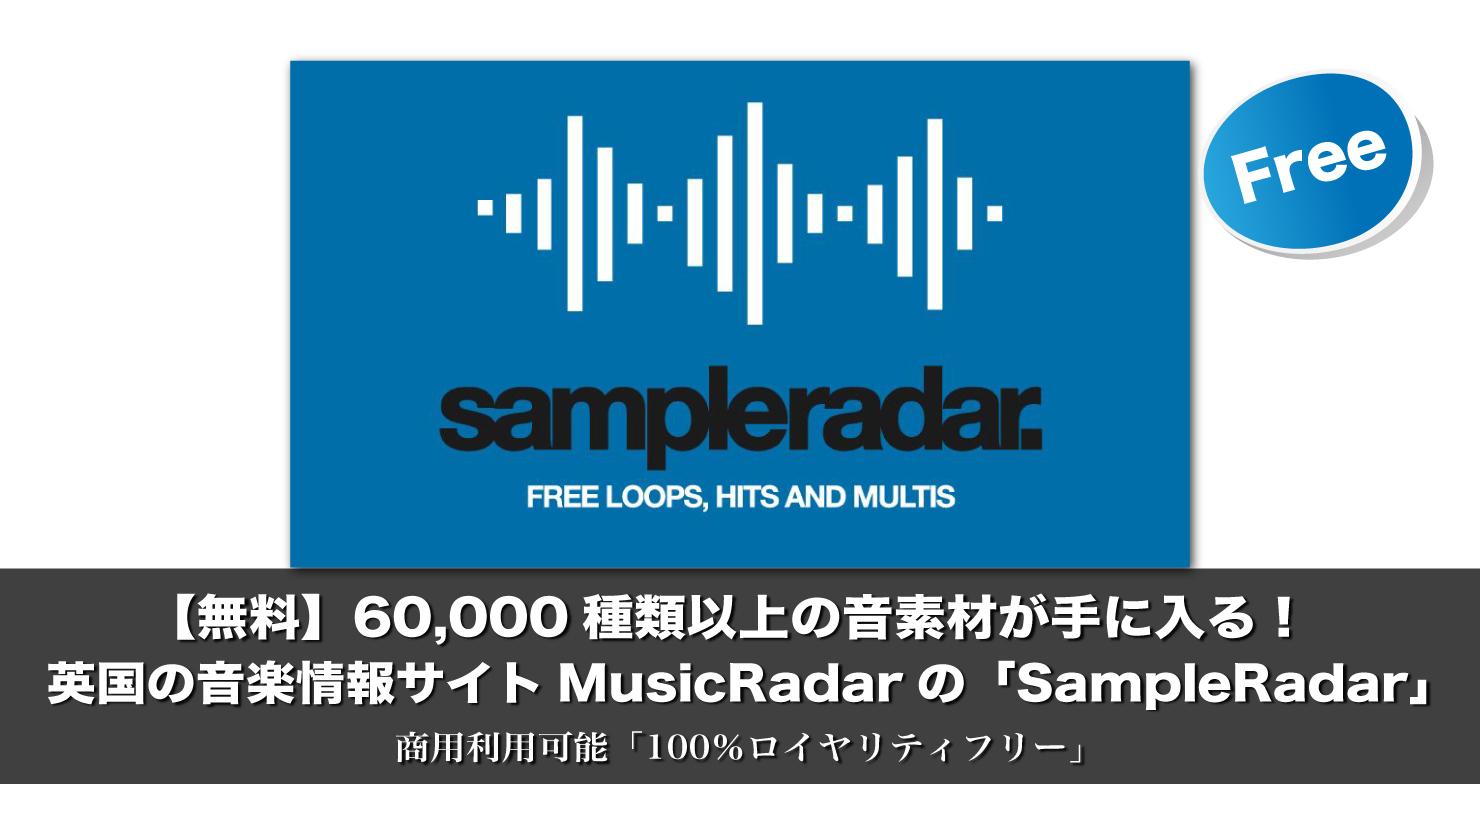 musicrader-samplerader-free